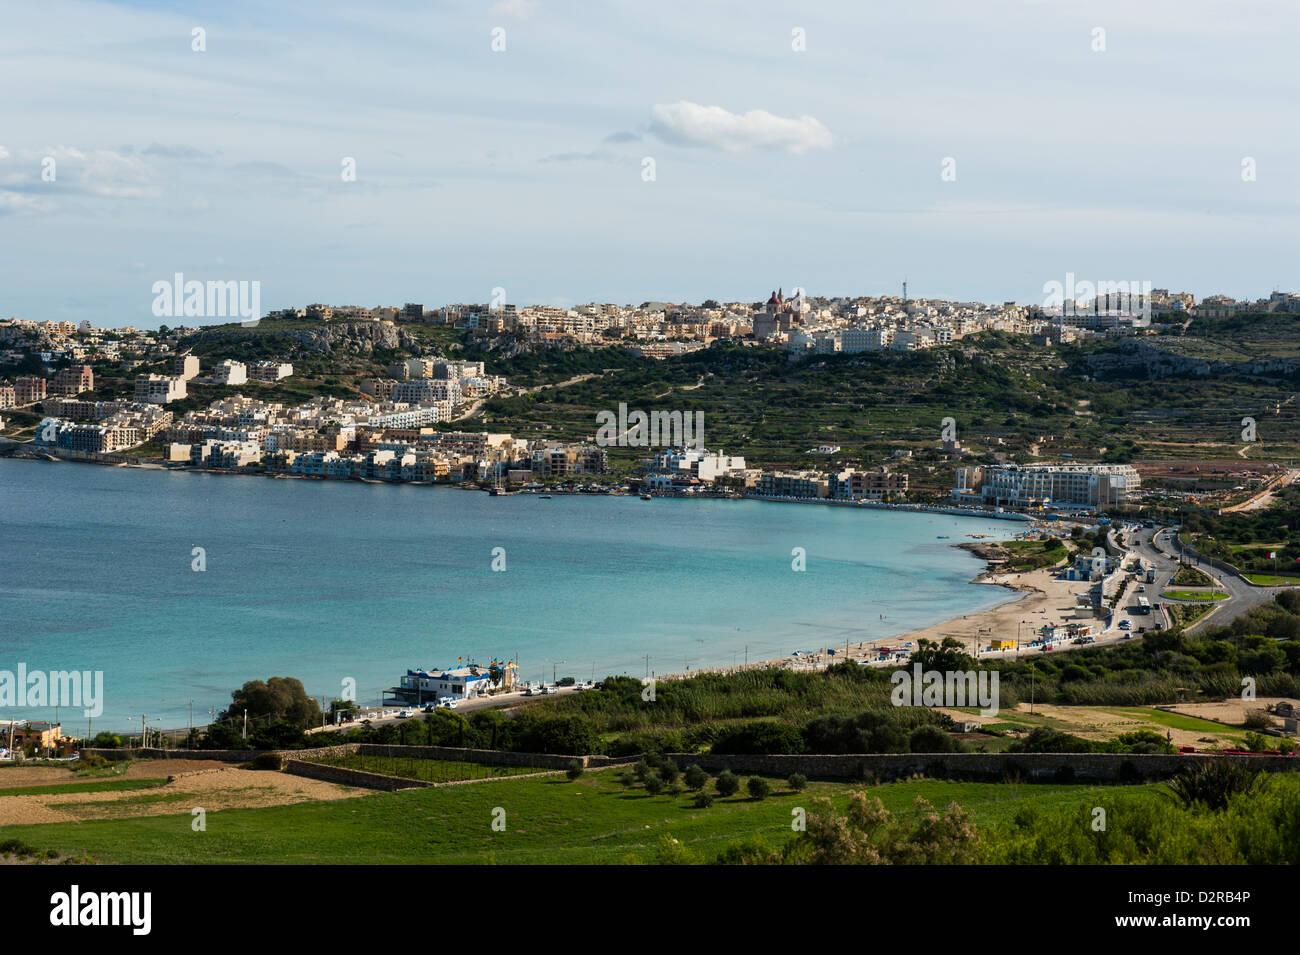 Bay of Il-Mellieha, Malta, Mediterranean, Europe - Stock Image